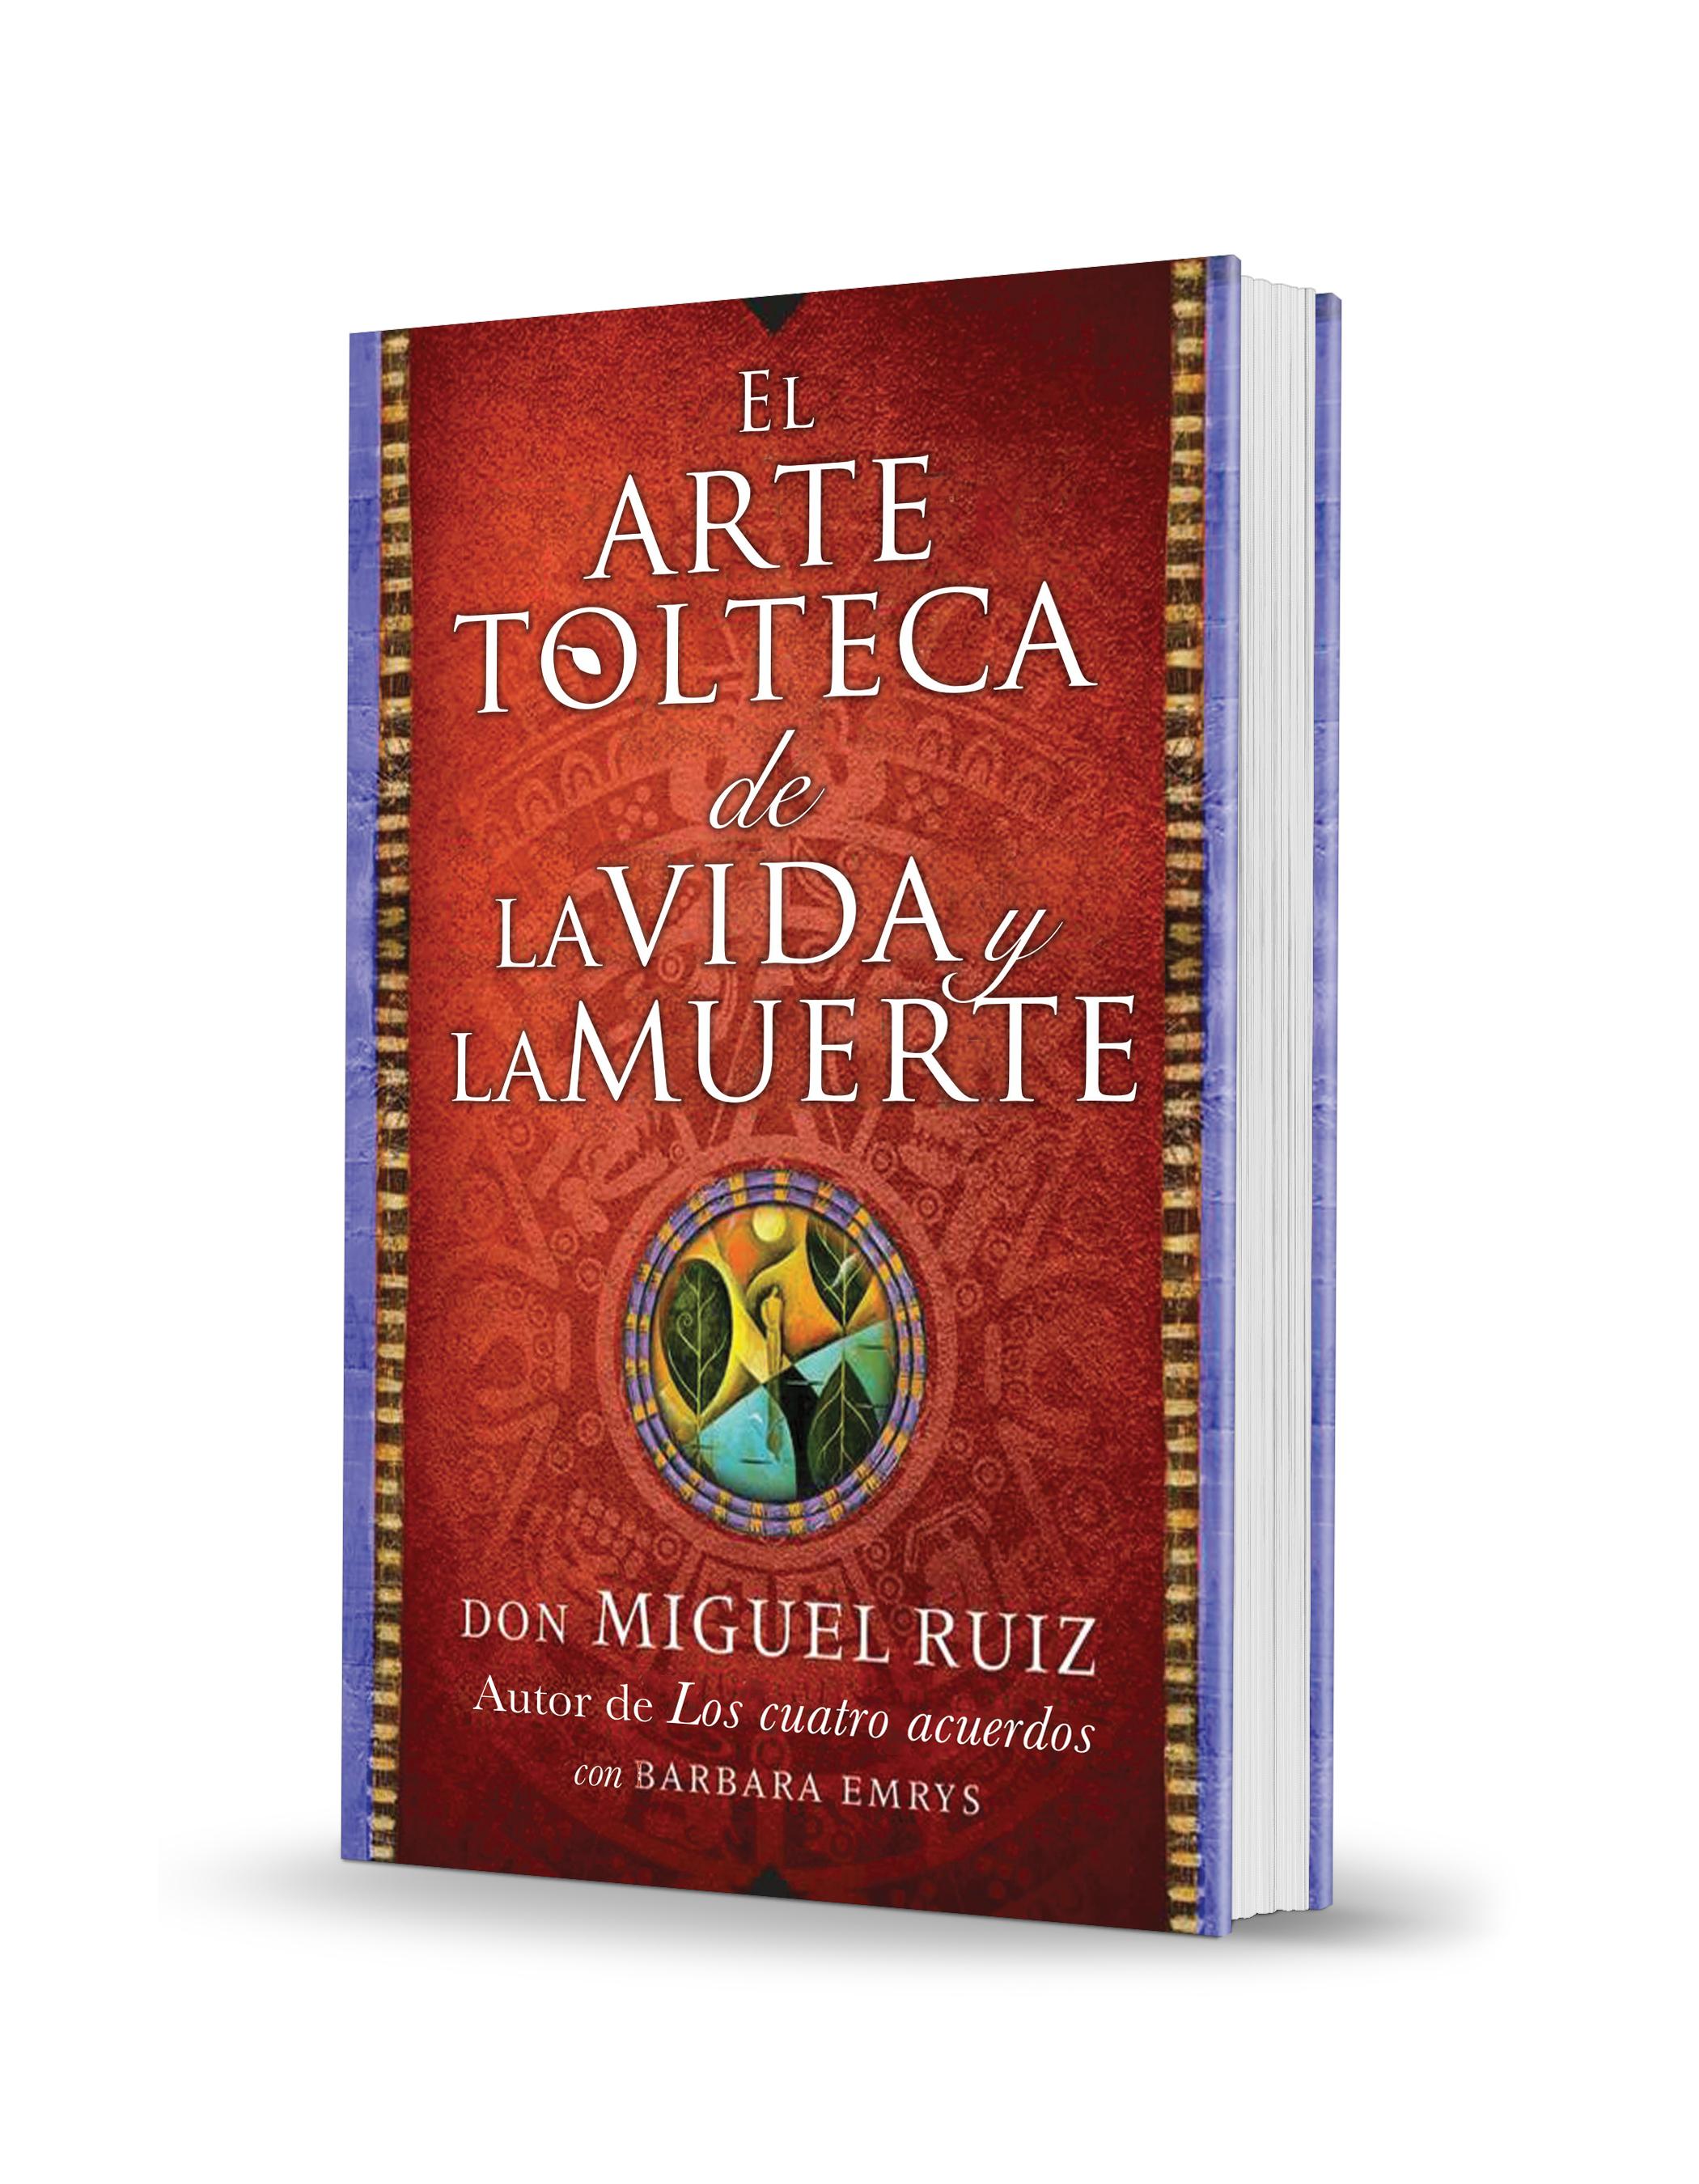 DMR-Book-Cover-Arte-Tolteca-3d.jpg